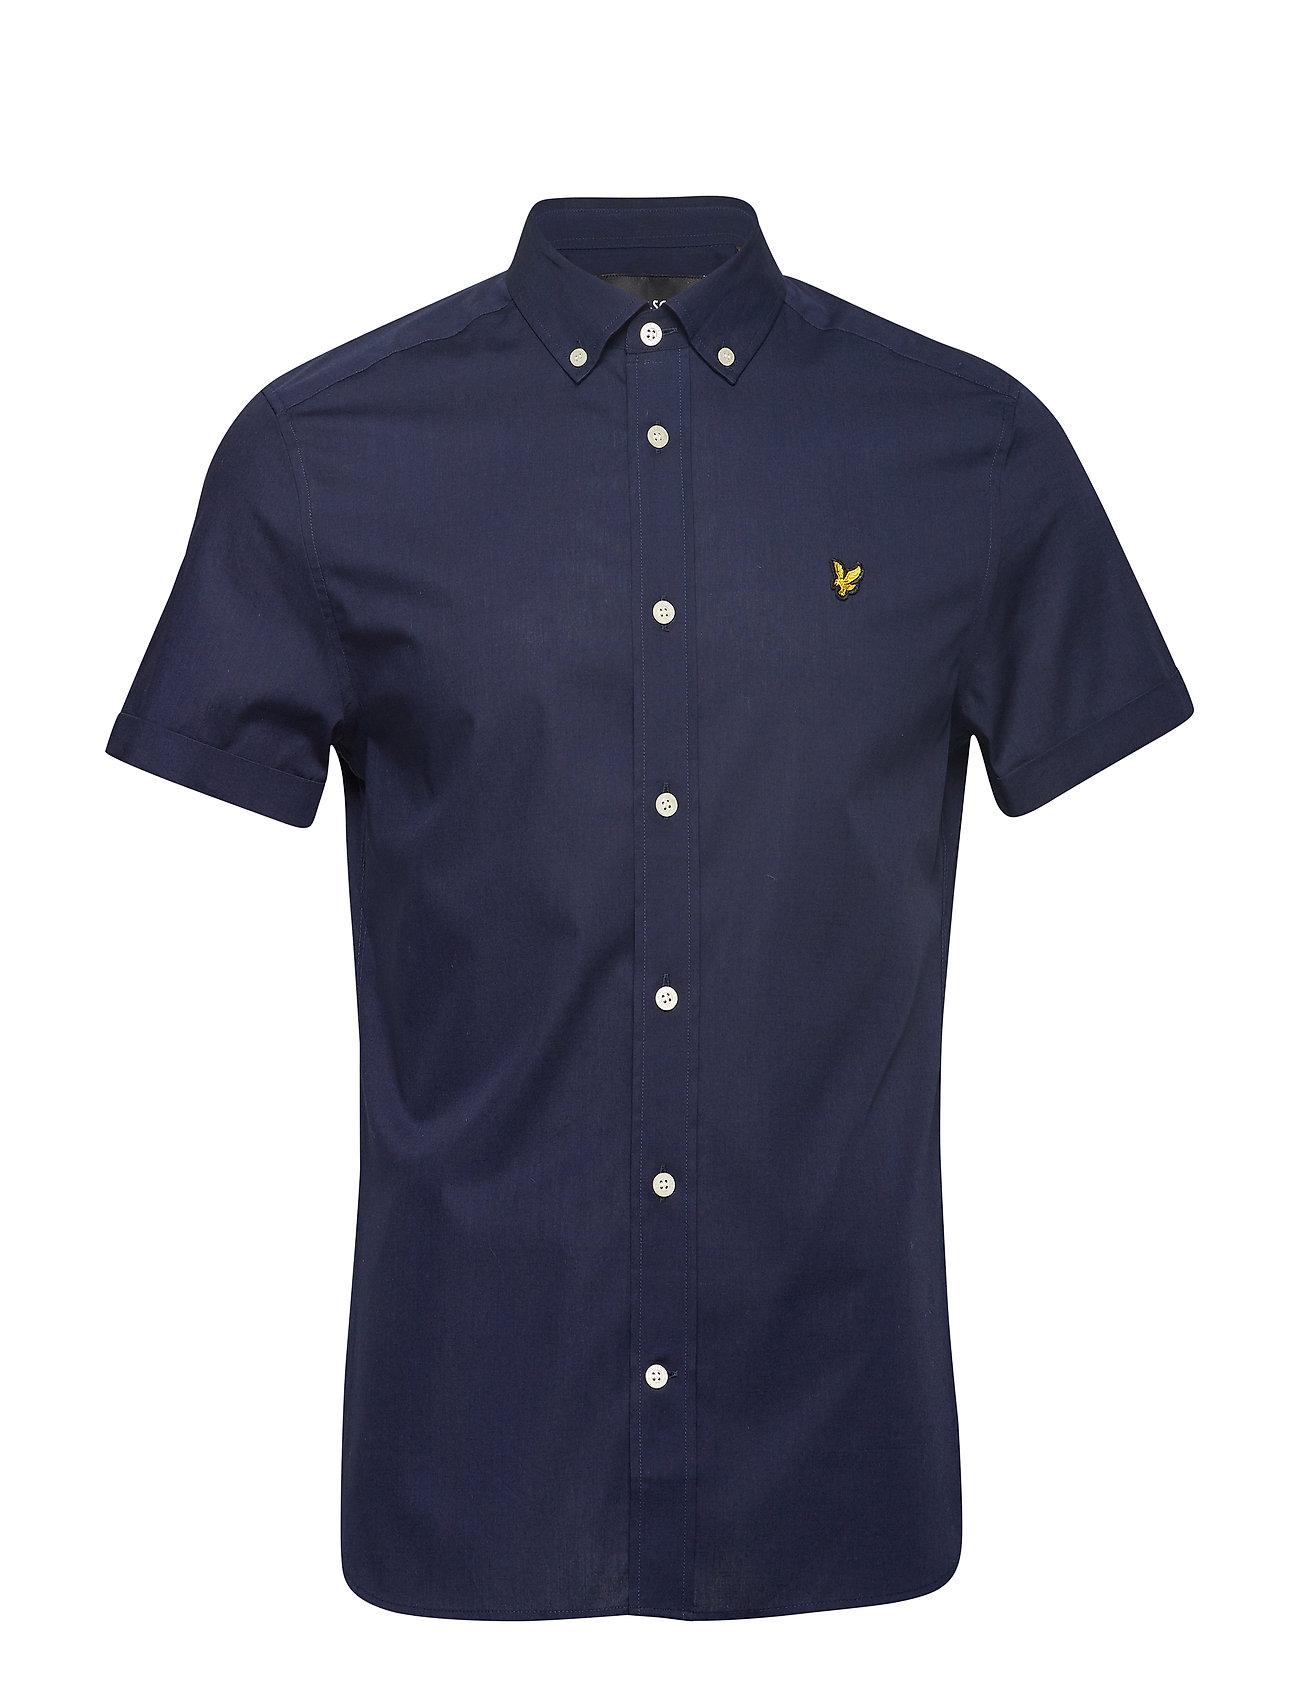 Lyle & Scott SS Slim Stretch Poplin Shirt - NAVY